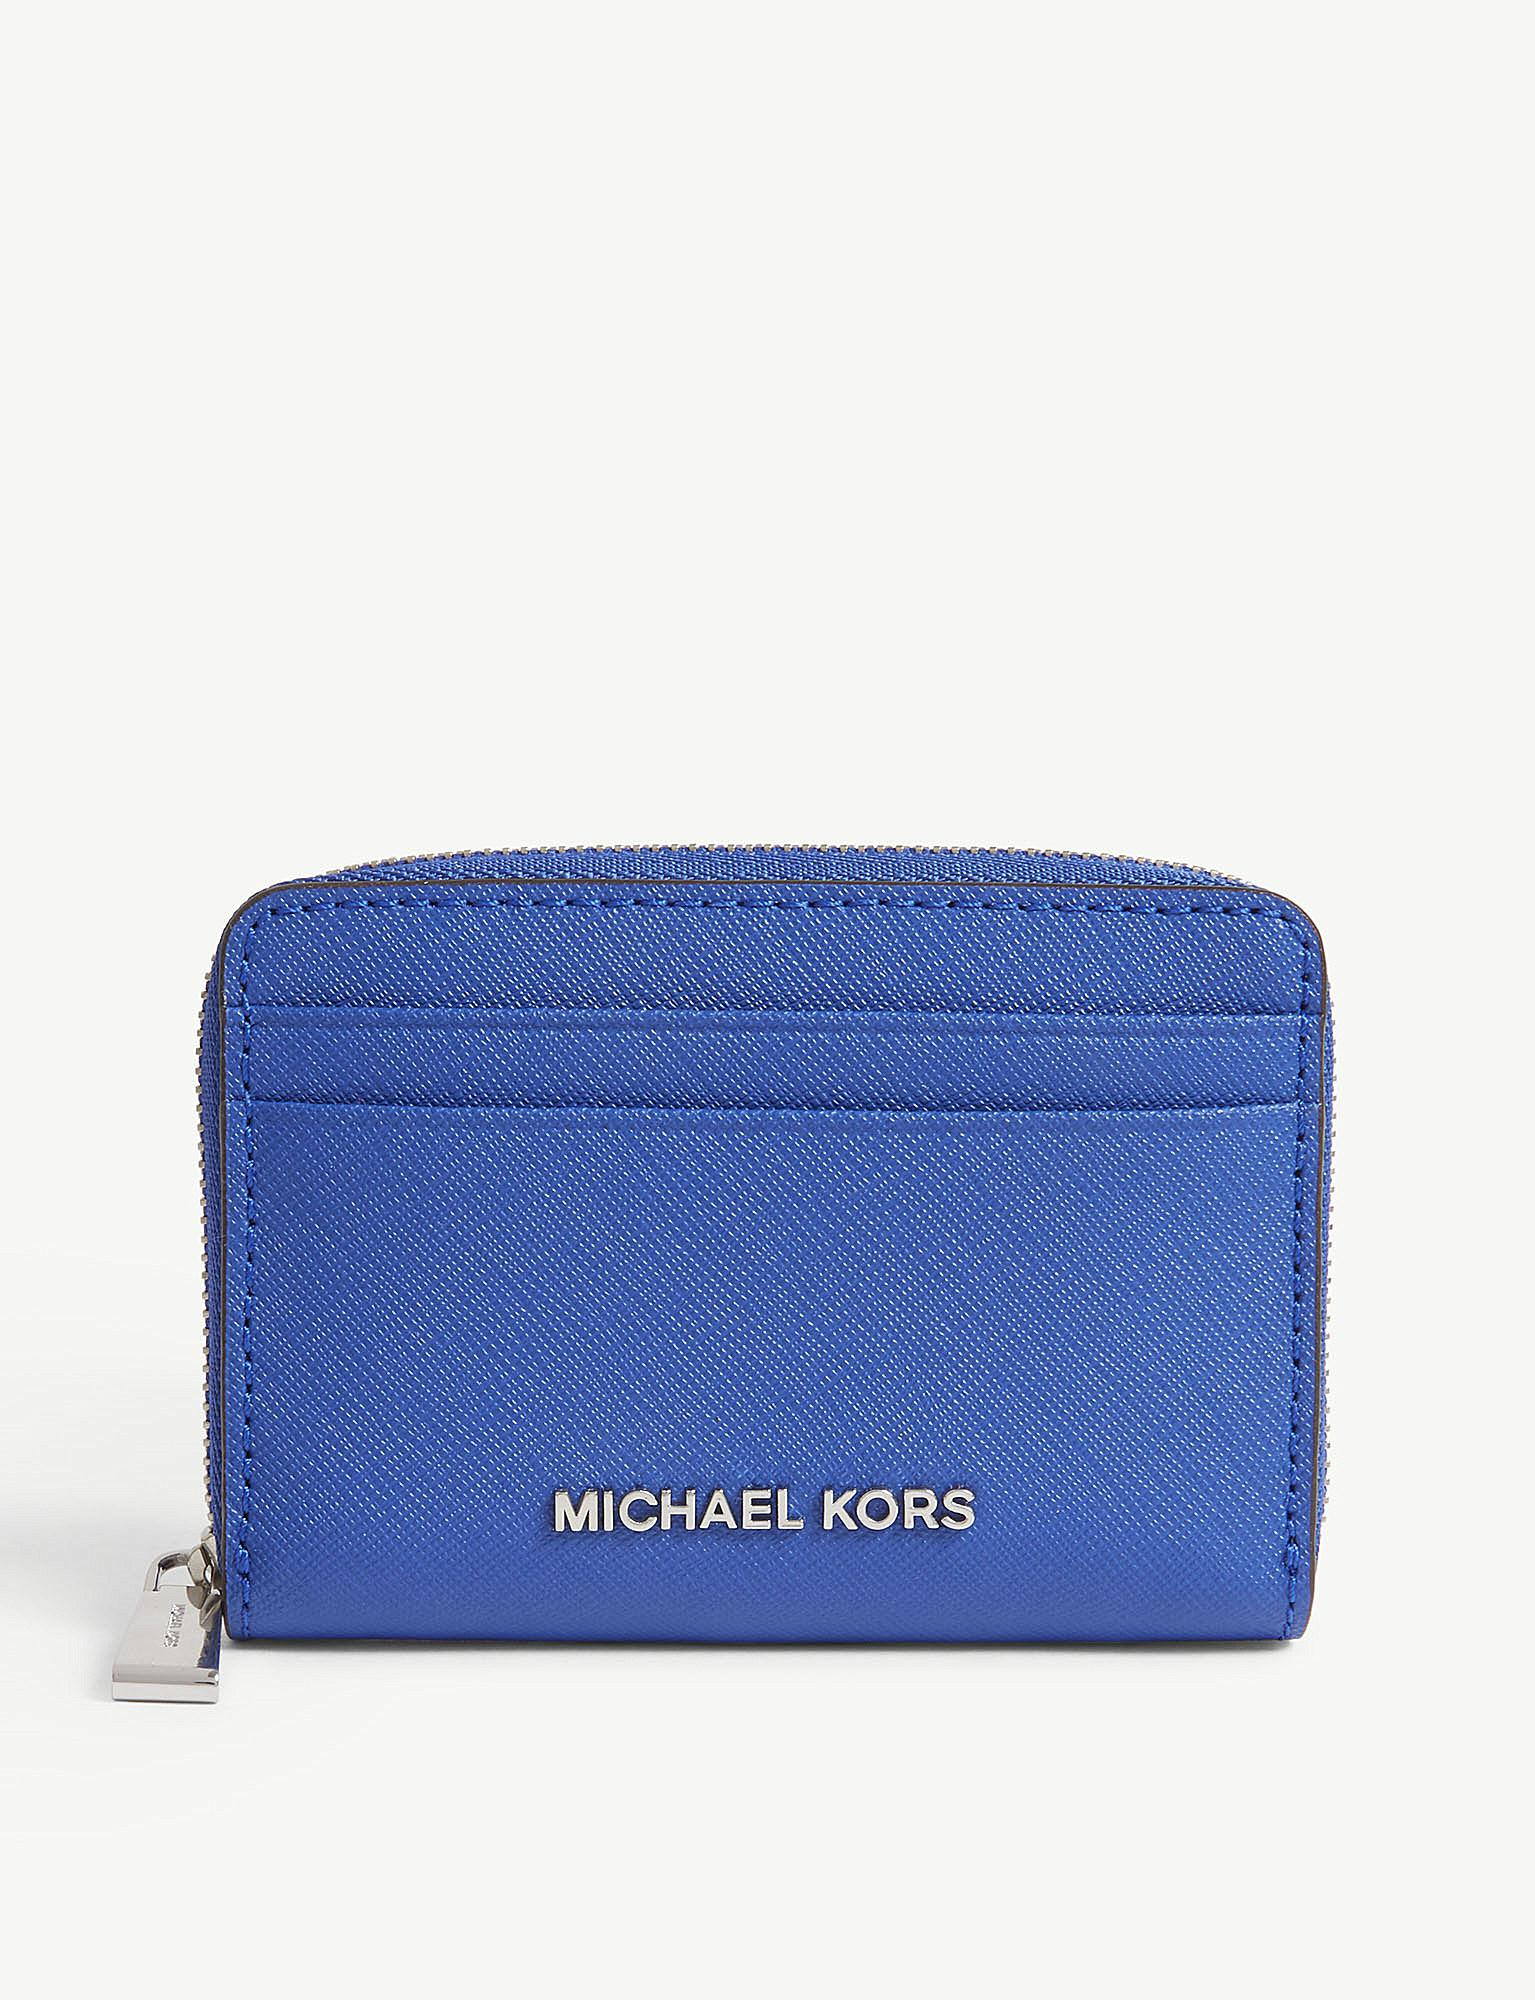 MICHAEL by Michael Kors Money Pieces Black Card Holder Michael Kors fGDafyBDB